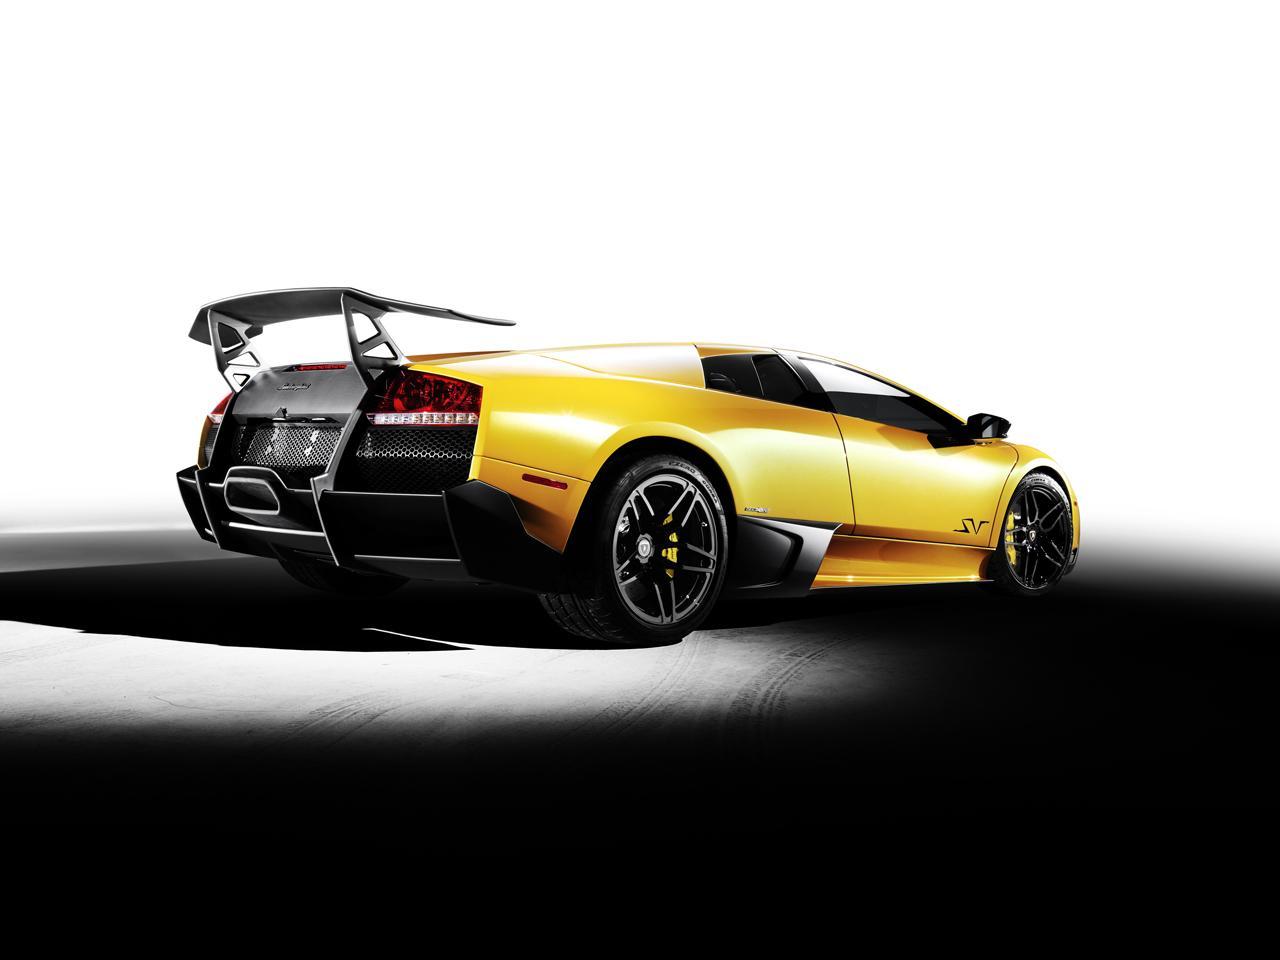 Lamborghini Murcielago LP670-4 Super Veloce 2